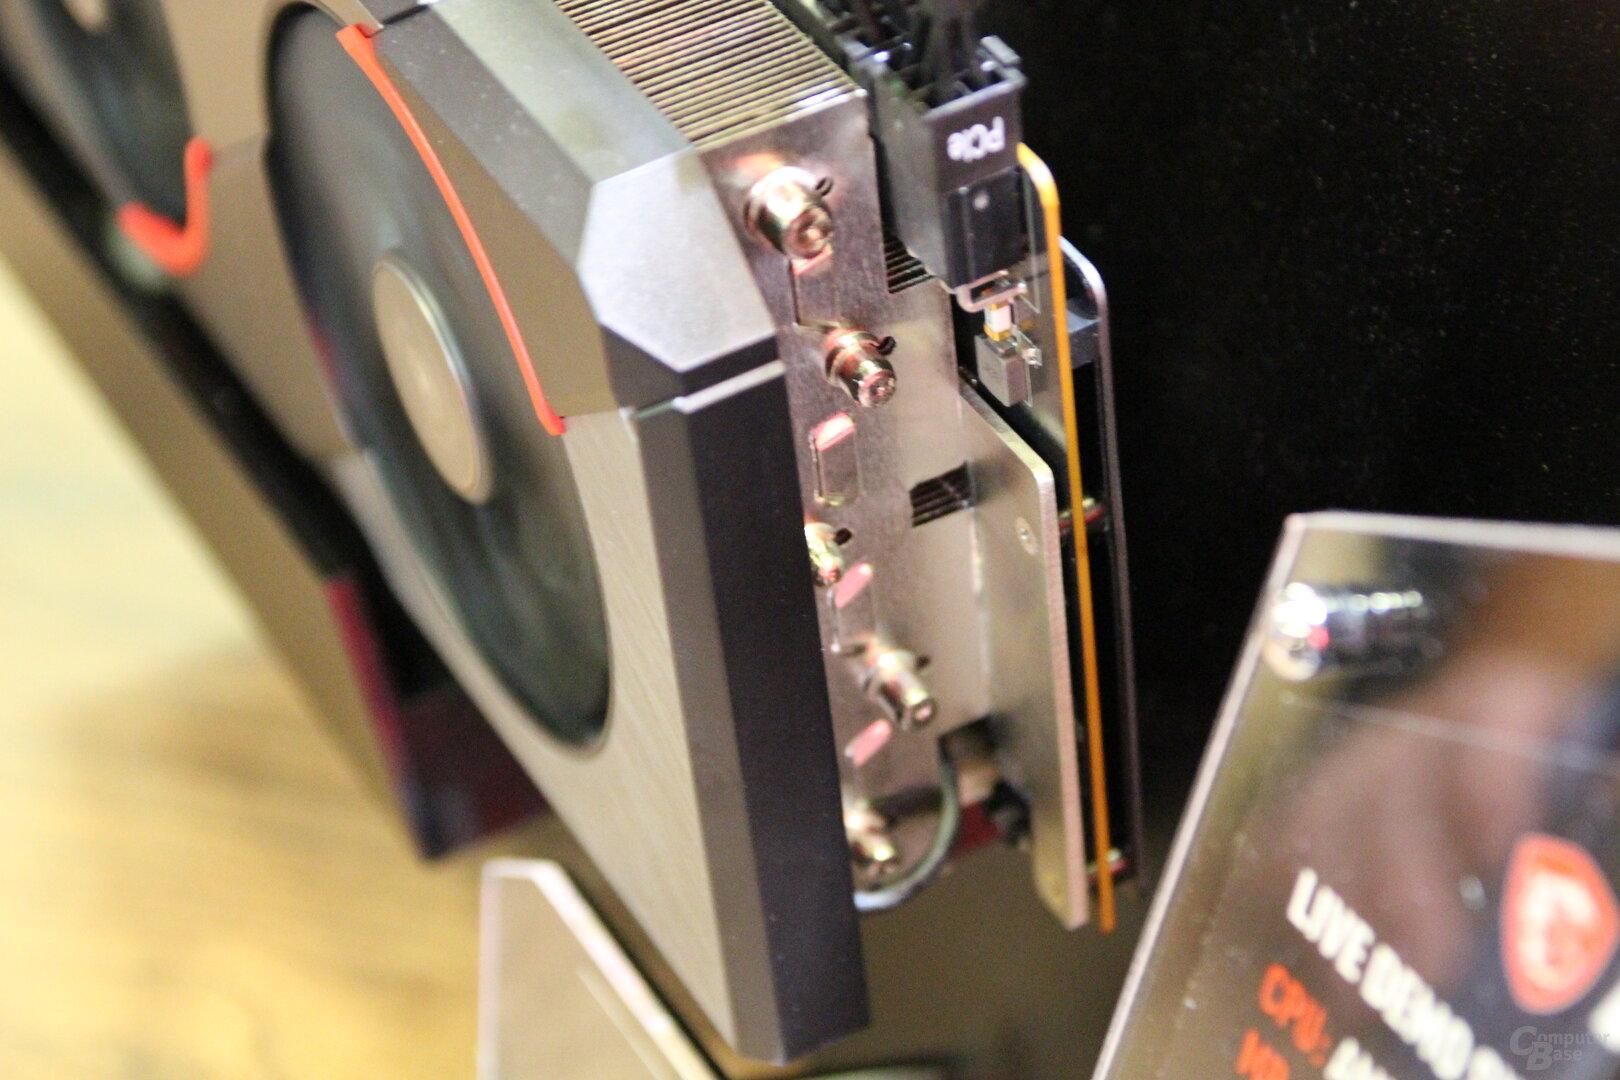 MSI Radeon RX 5700 XT Gaming